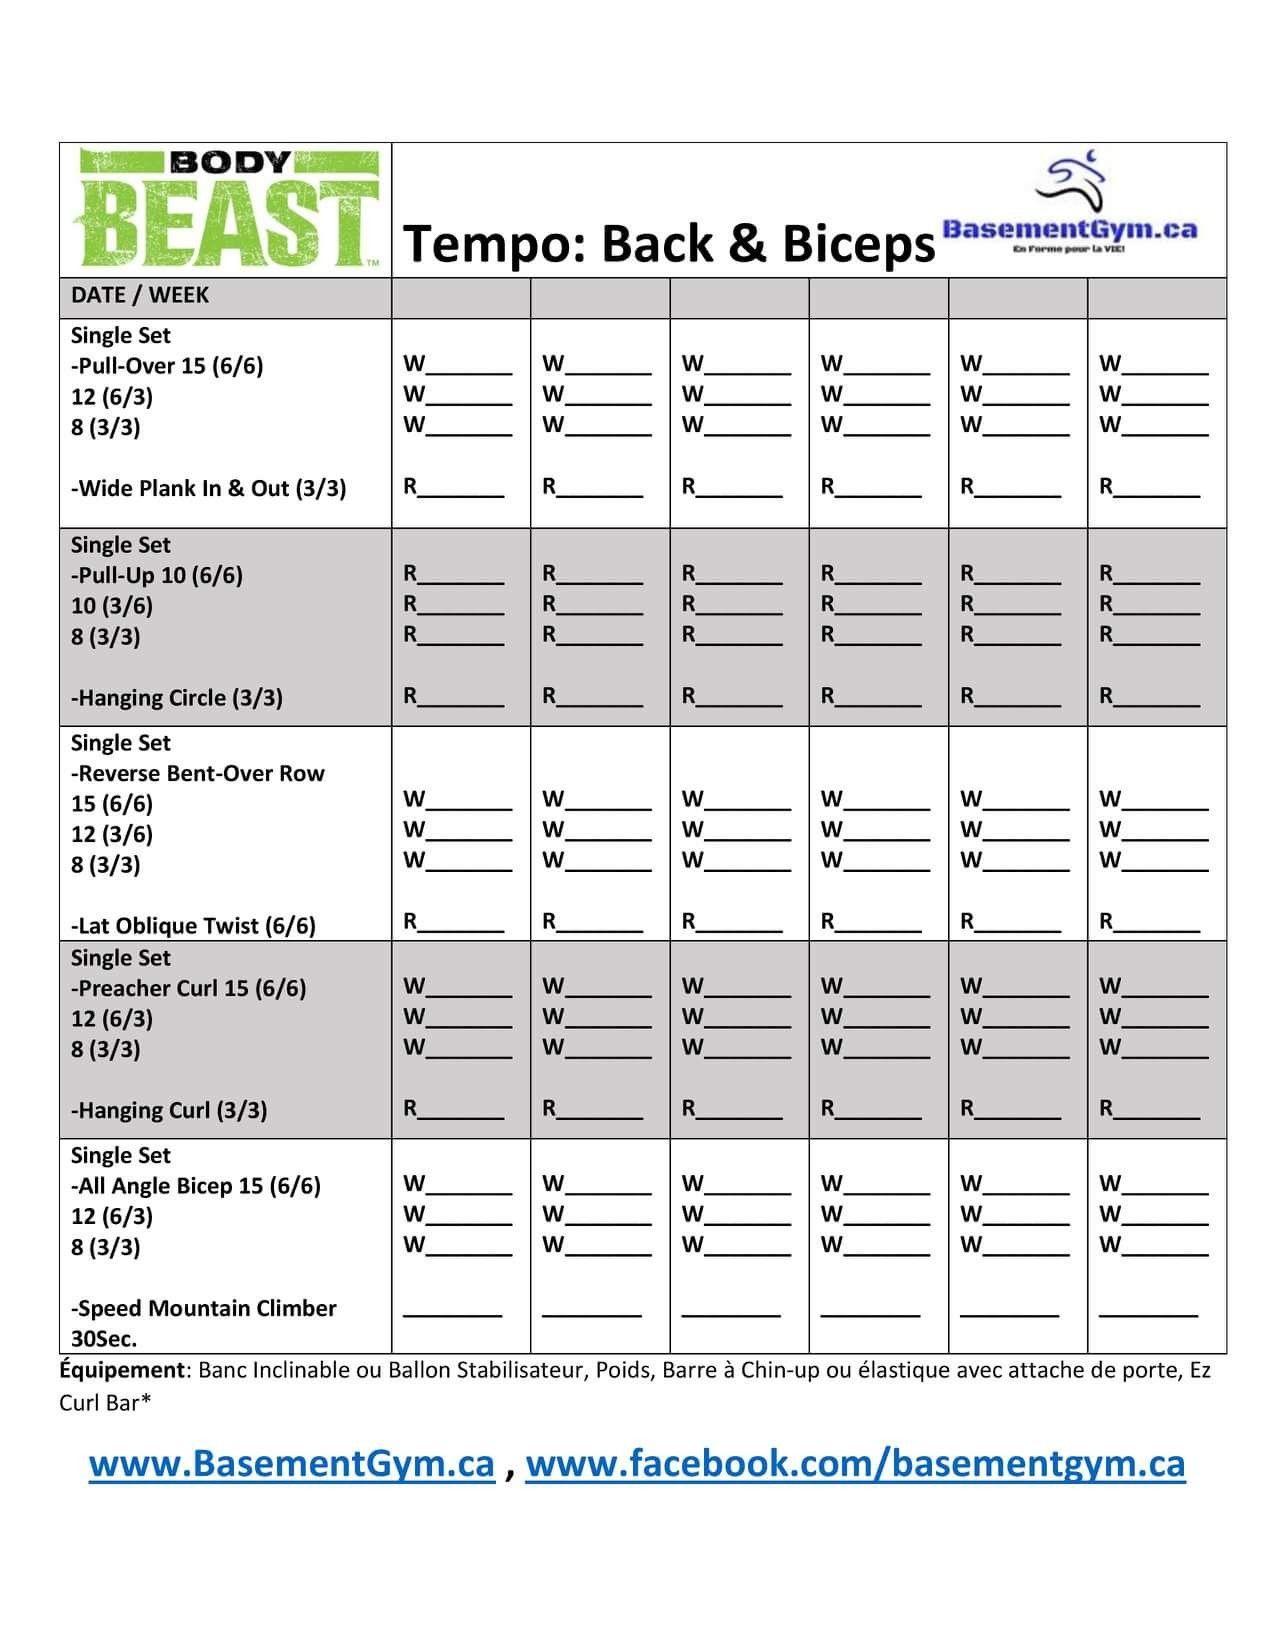 Body Beast Tempo Back Biceps Worksheet